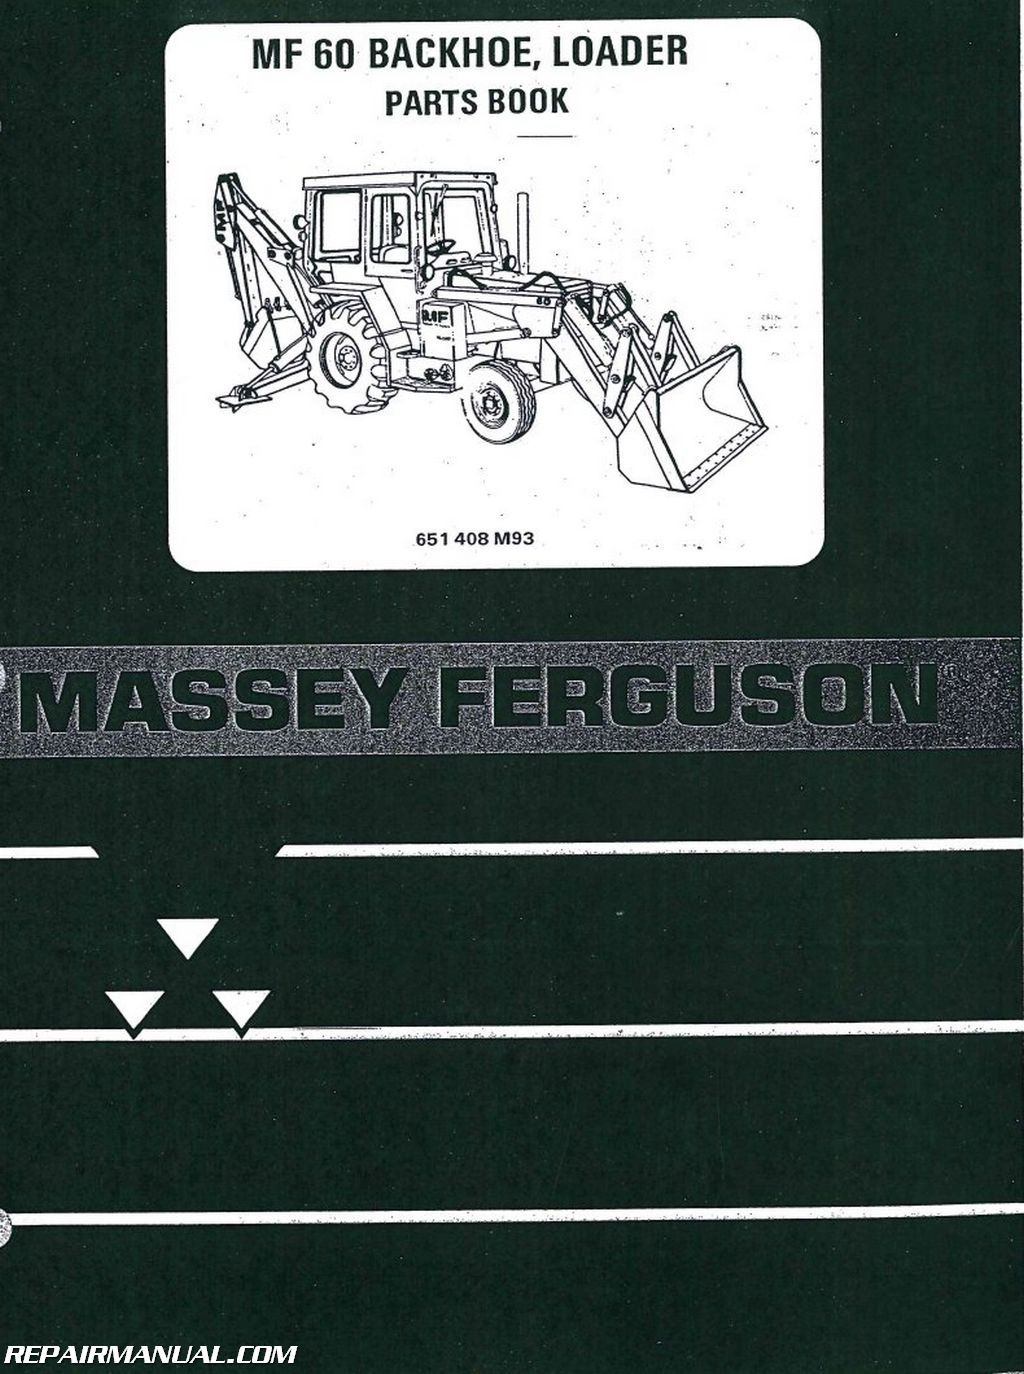 Massey-Ferguson MF60 Tractor Loader Backhoe Parts Manual